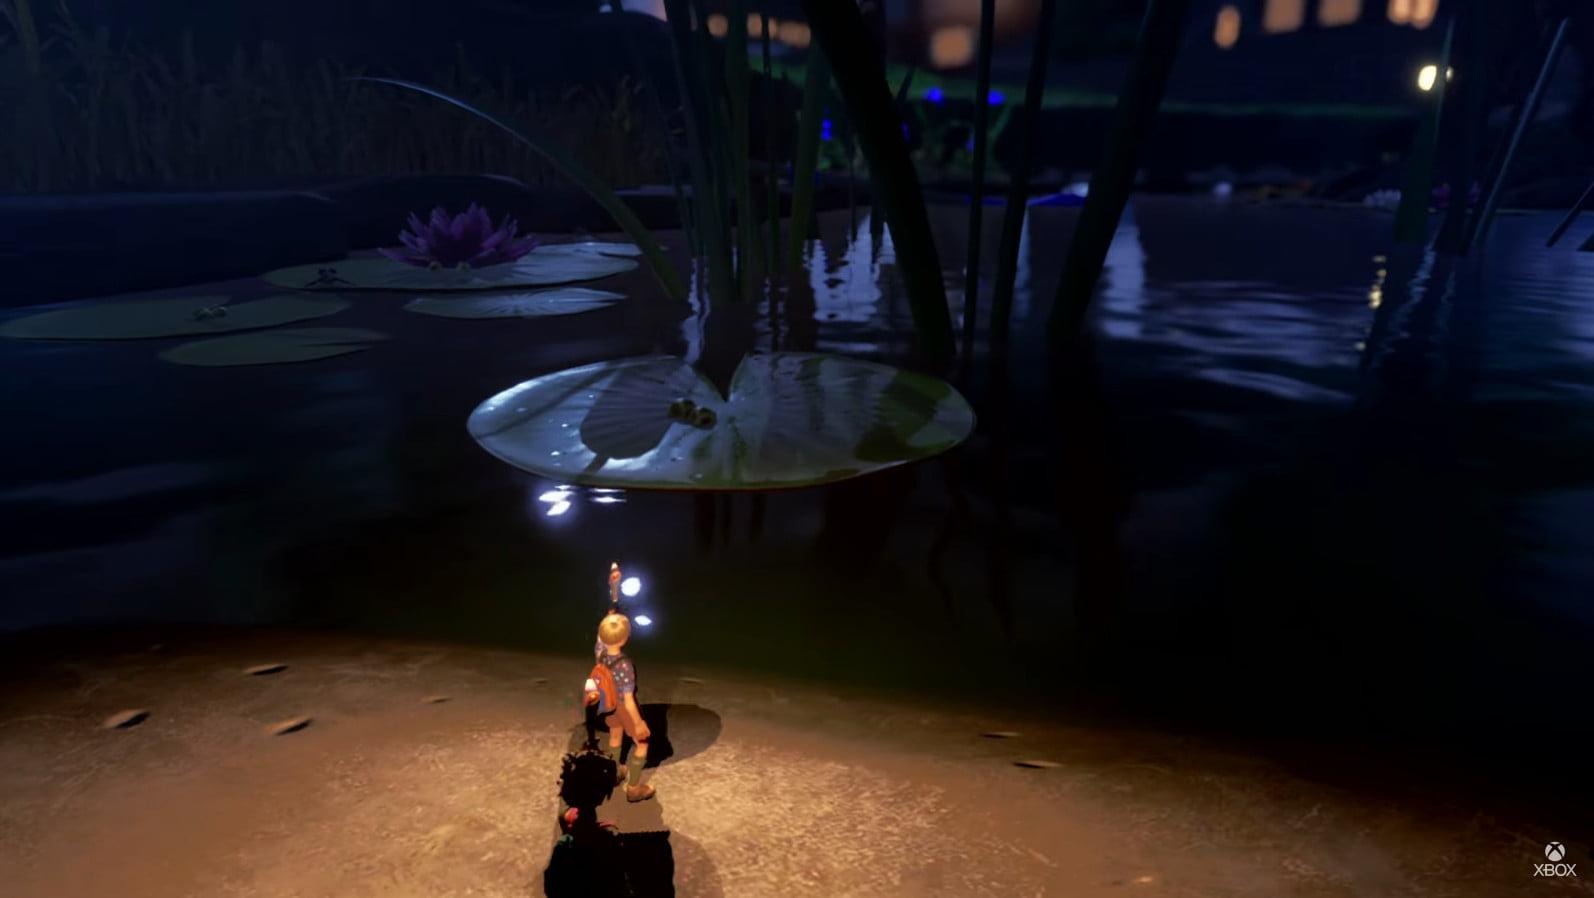 The koi pond at night